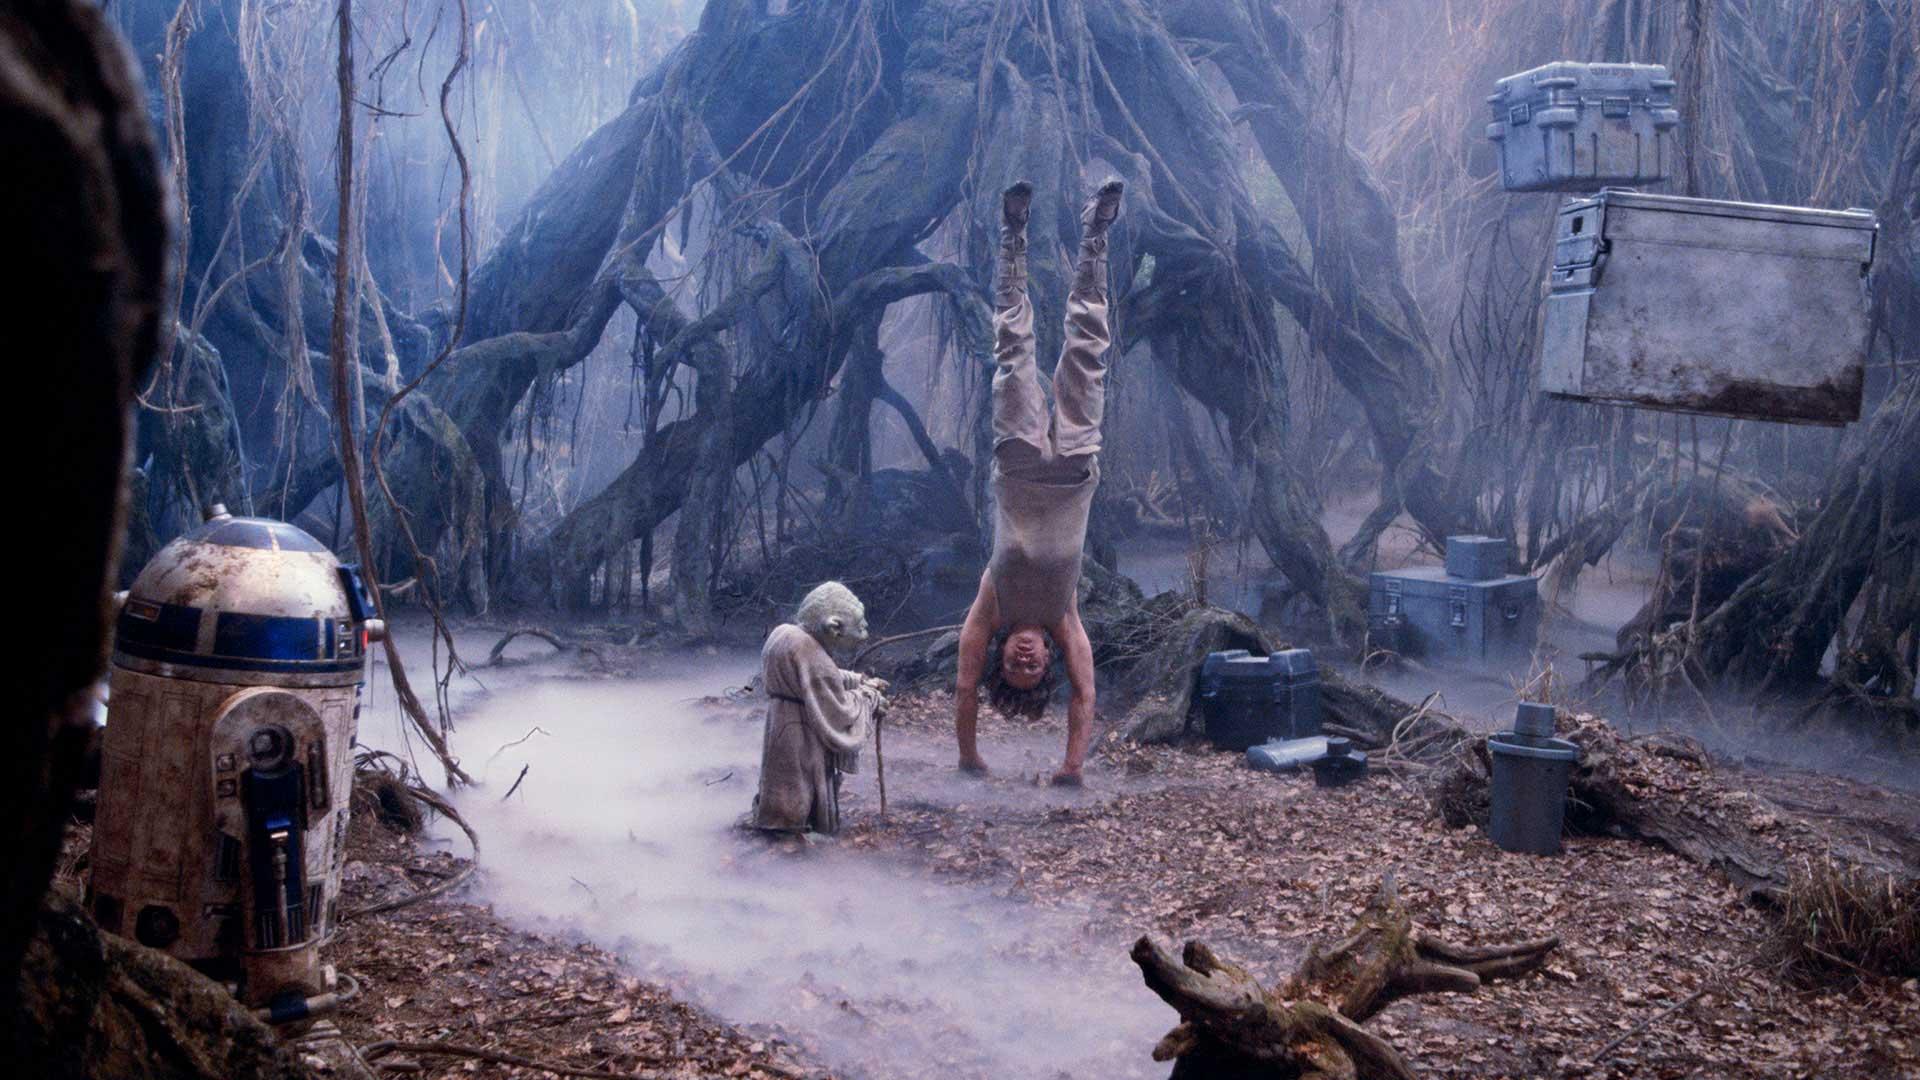 Star Wars The Last Jedi, Easter Egg, Training Montage, Luke Skywalker, Yoda